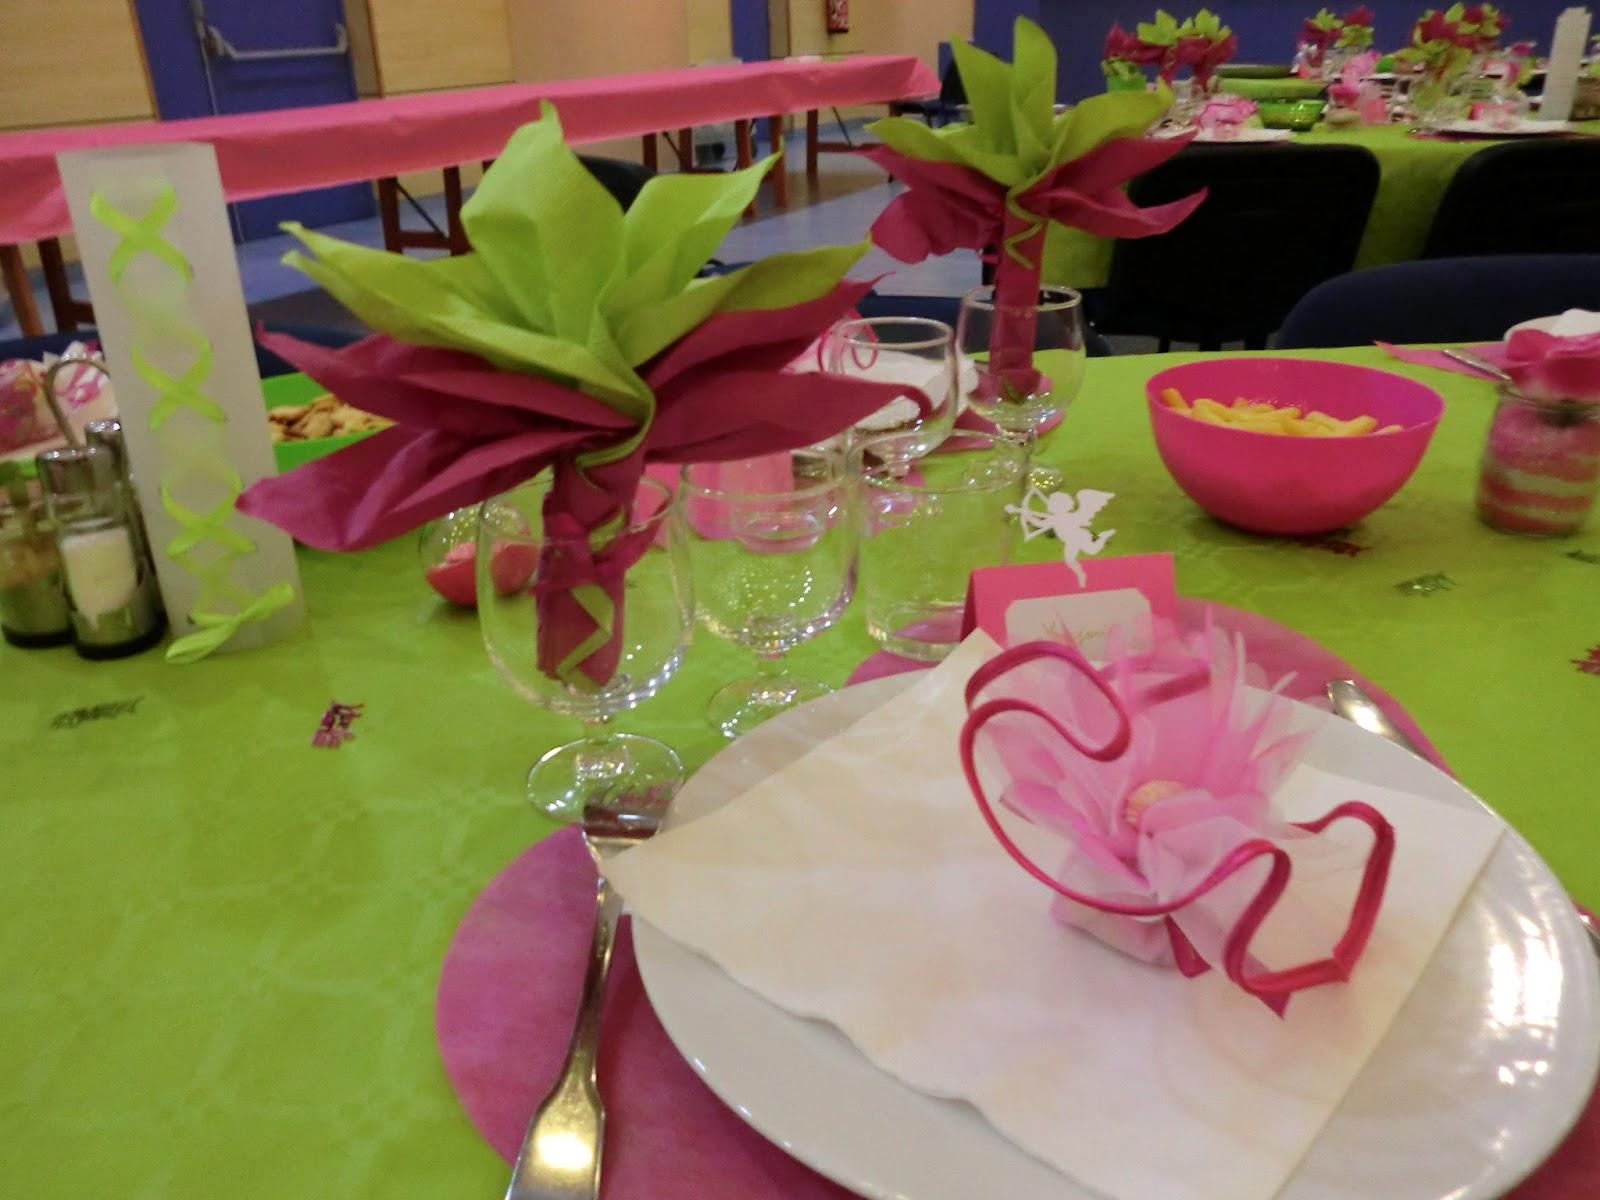 id et photo d coration mariage decoration table mariage idee couleur vert photo d coration. Black Bedroom Furniture Sets. Home Design Ideas